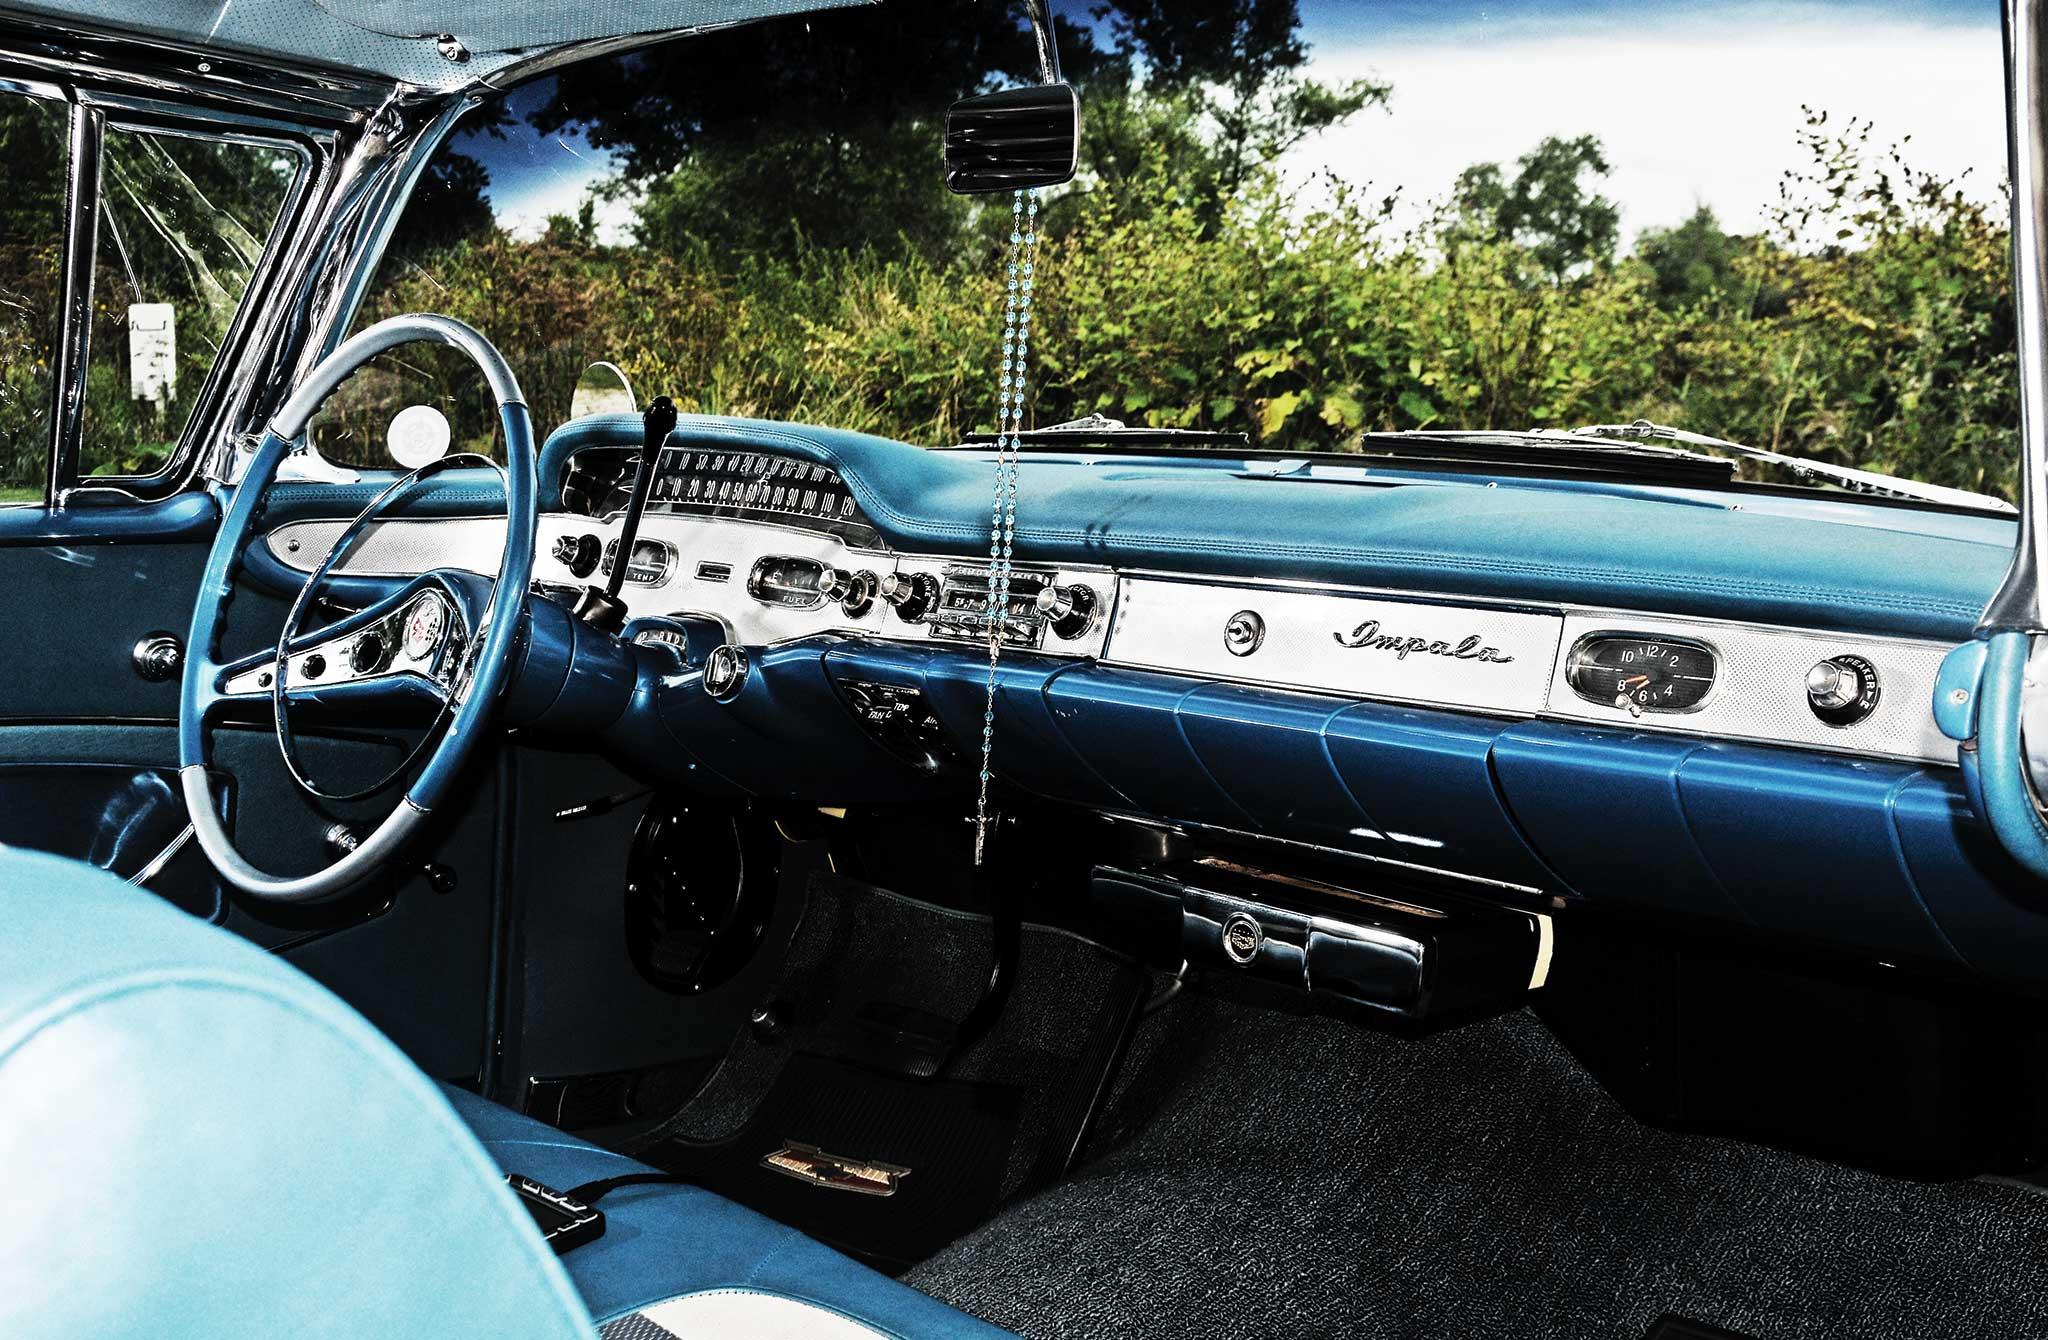 1958 Chevrolet Impala Highway To Heaven Lowrider